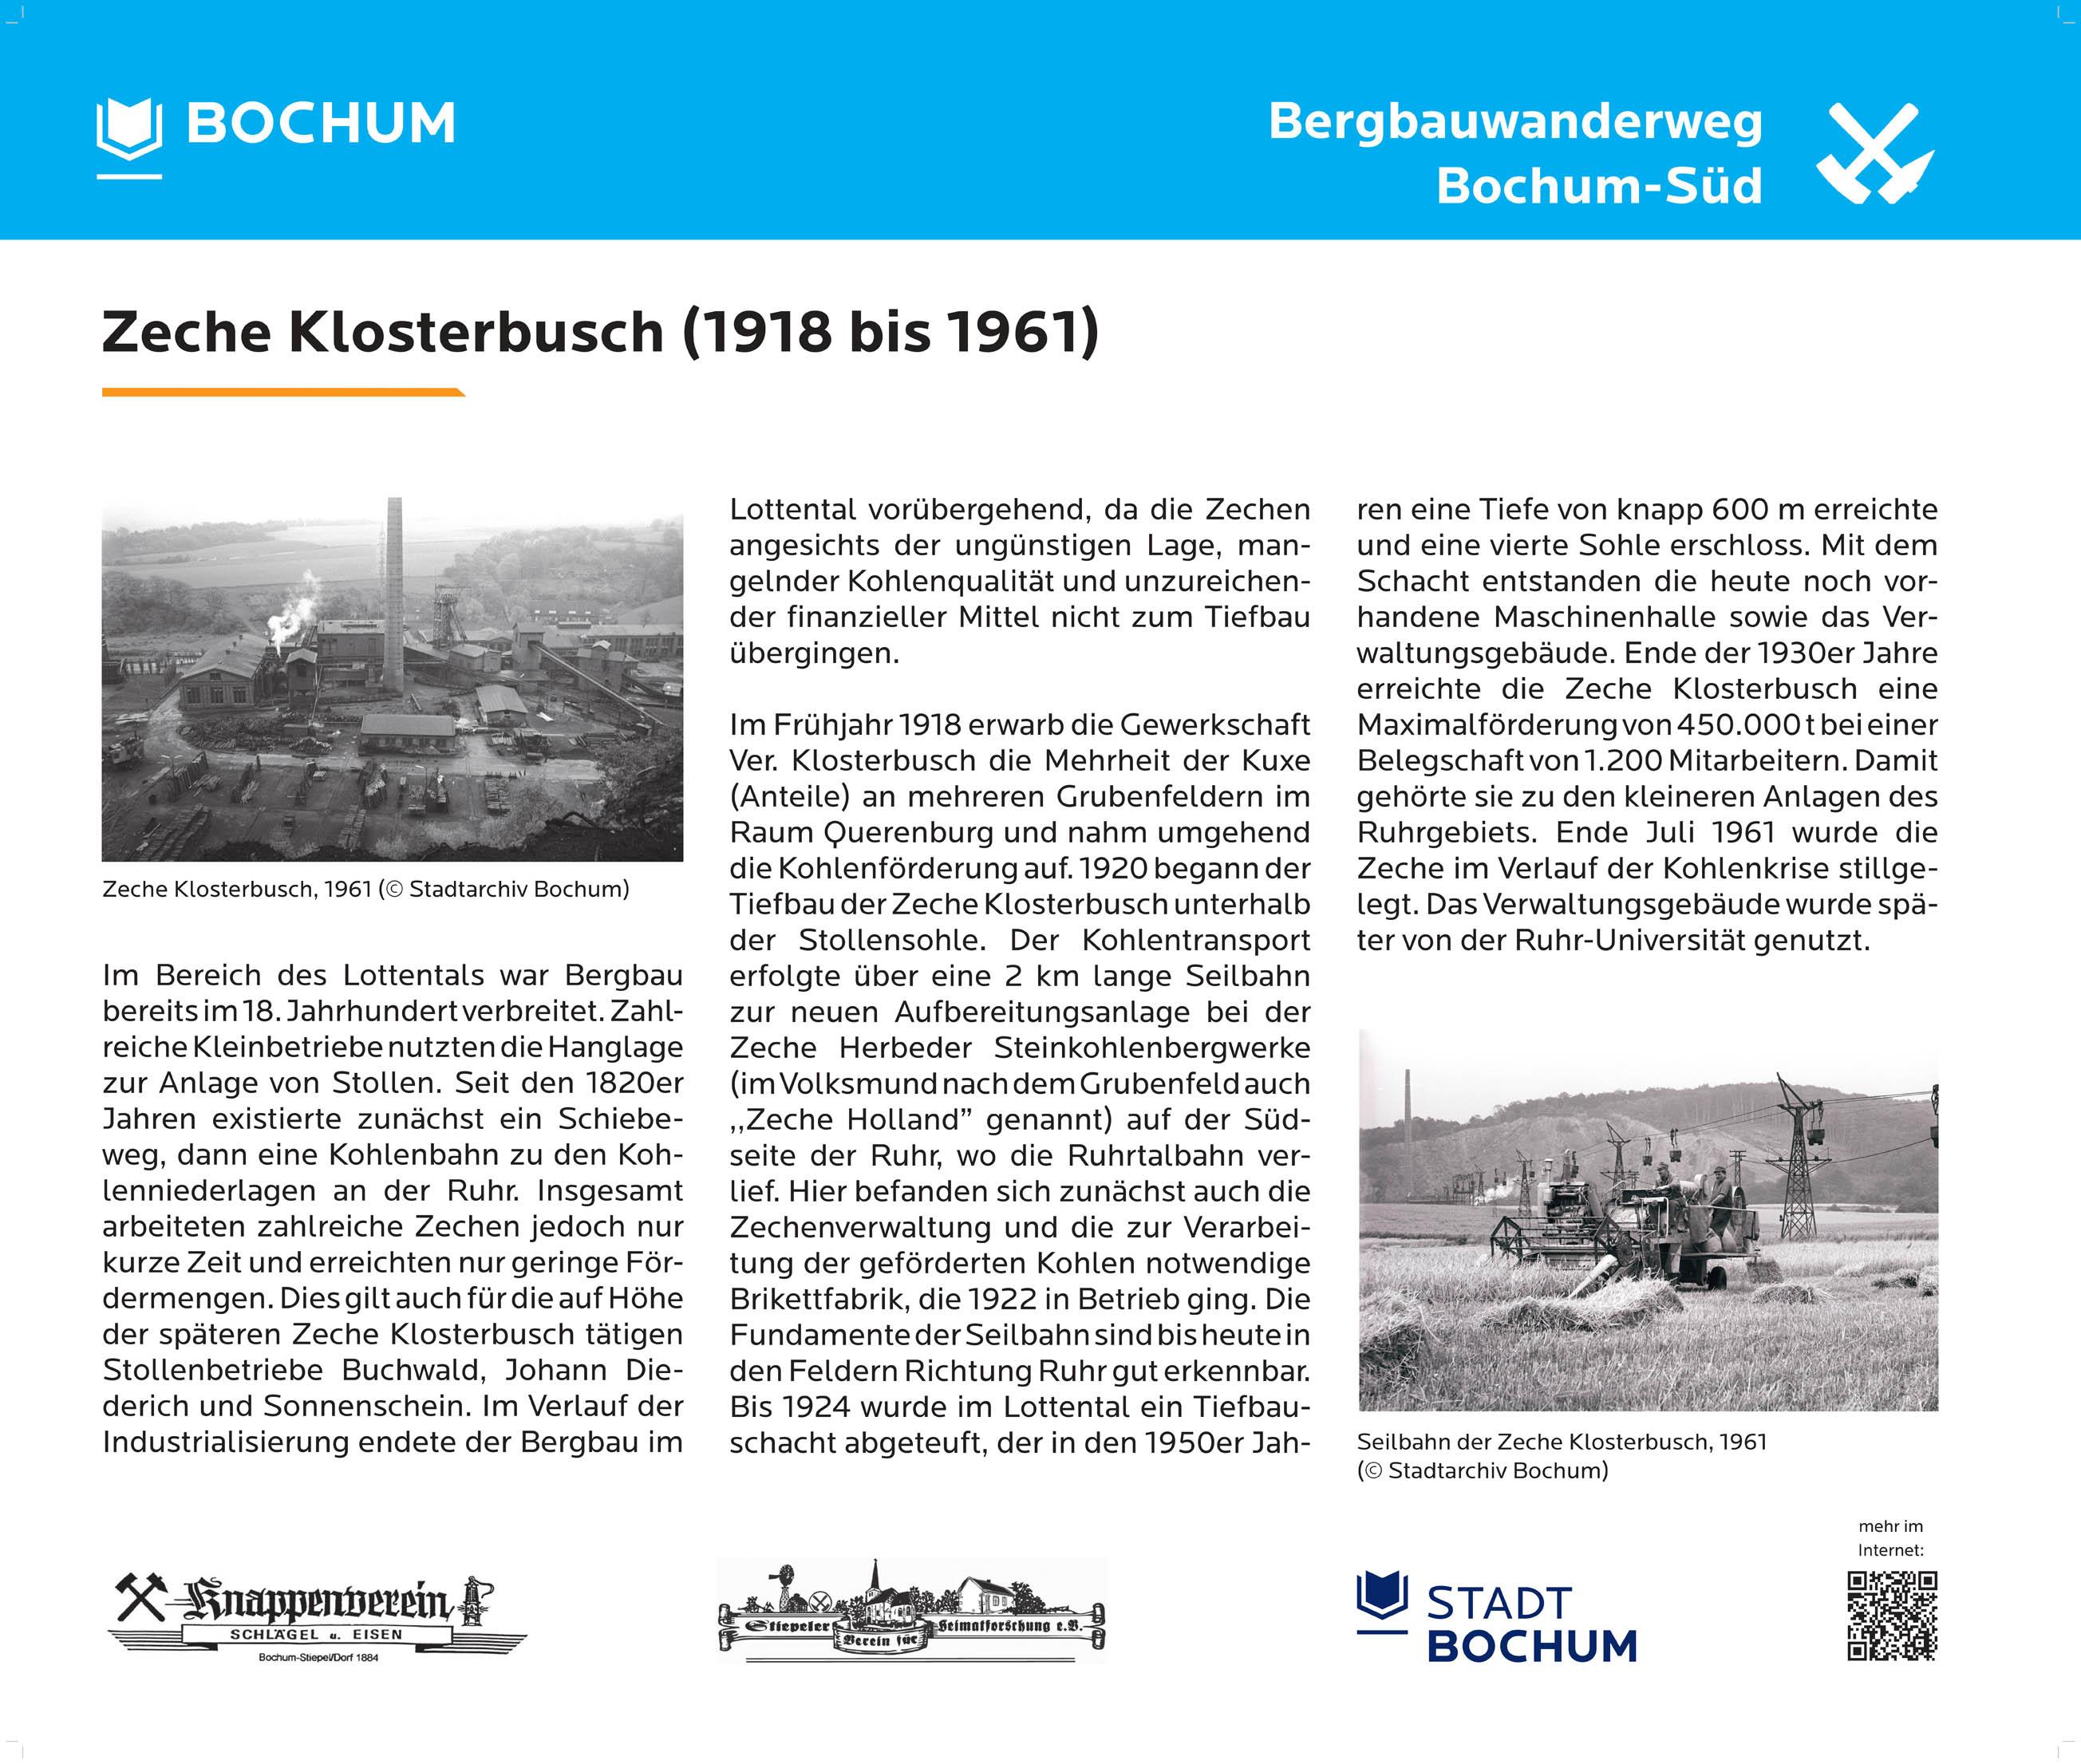 7_klosterbusch_bochum_stiepel